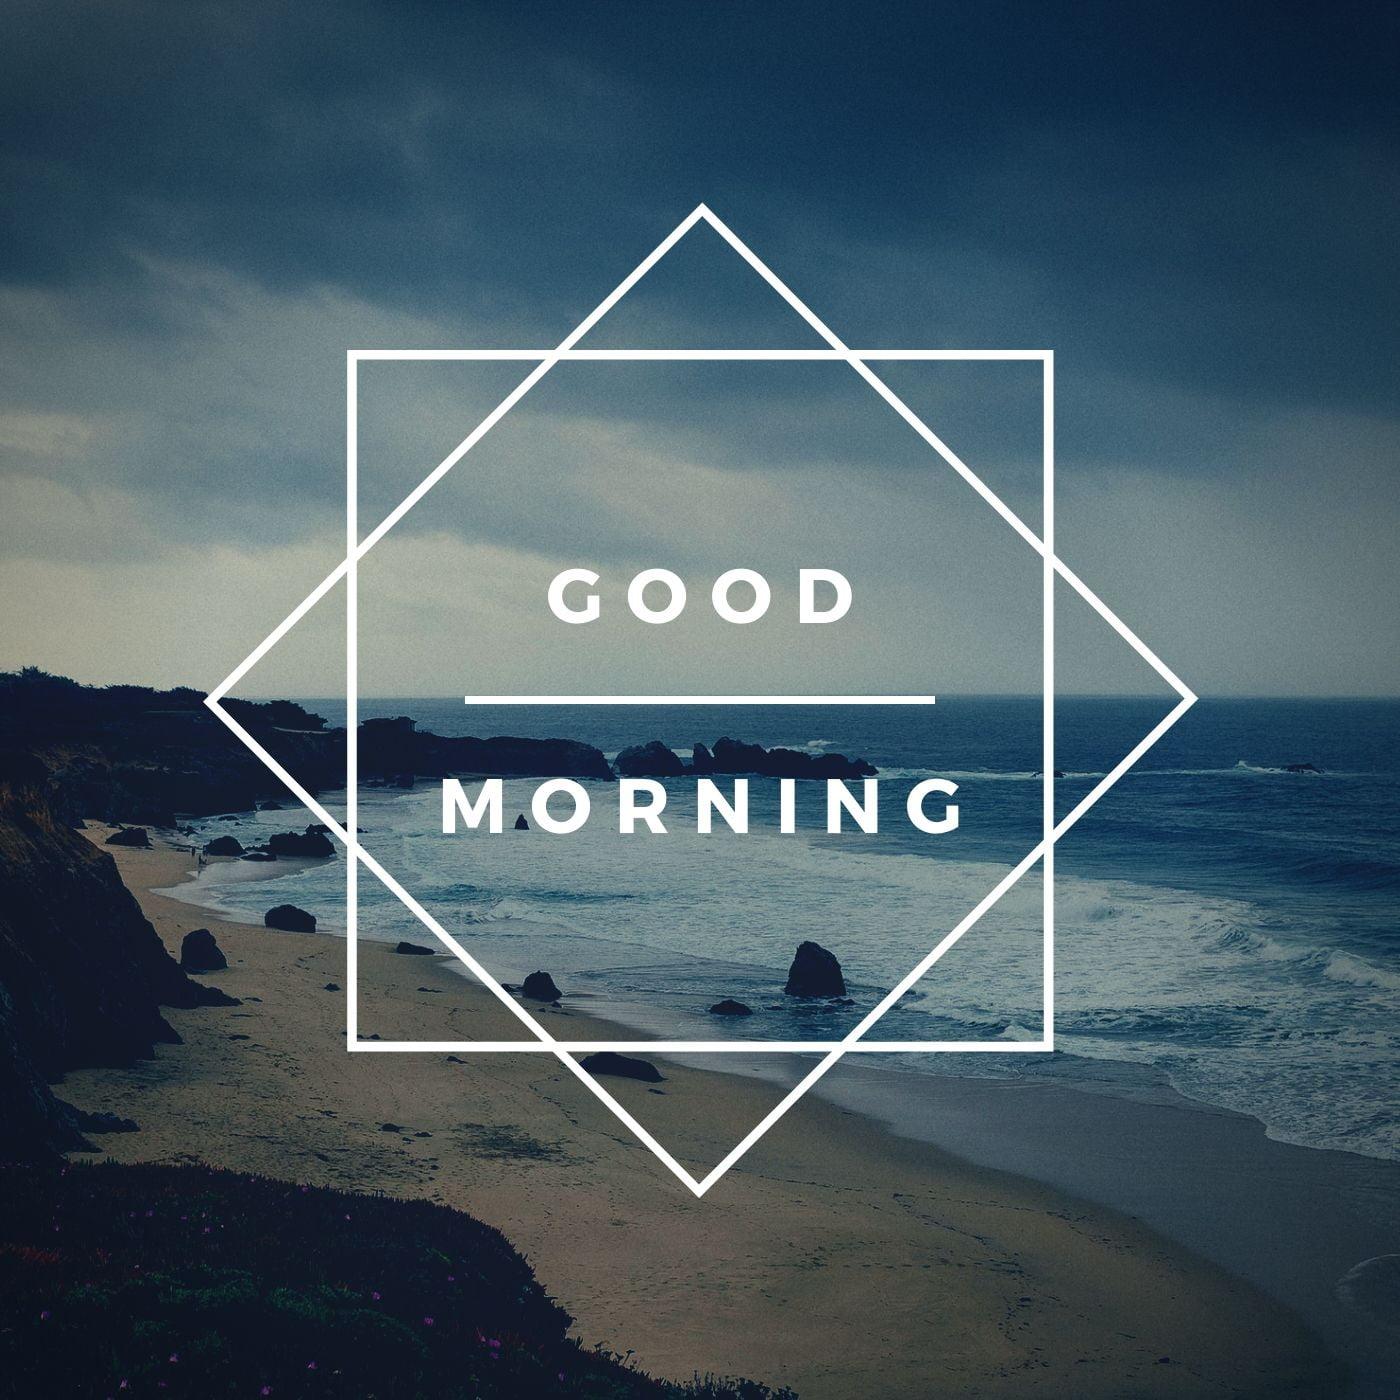 Good Morning Beach Nature Image full HD free download.